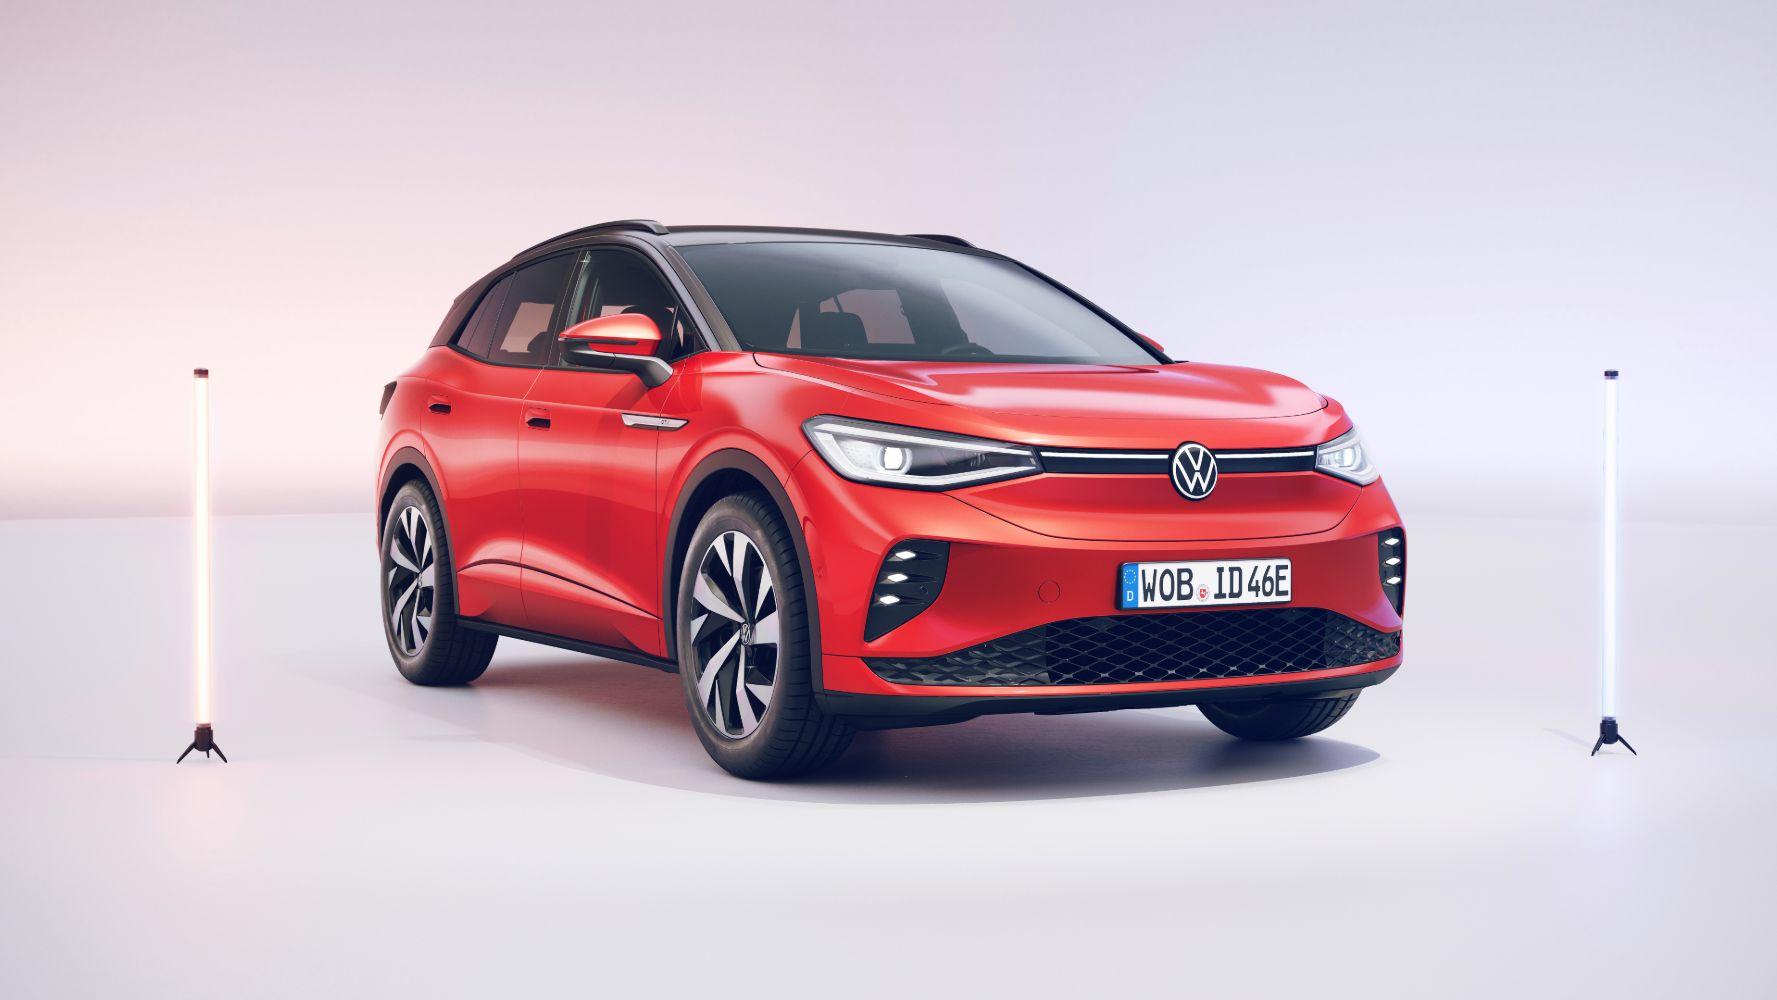 Volkswagen electric VW ID.4 GTX electric car